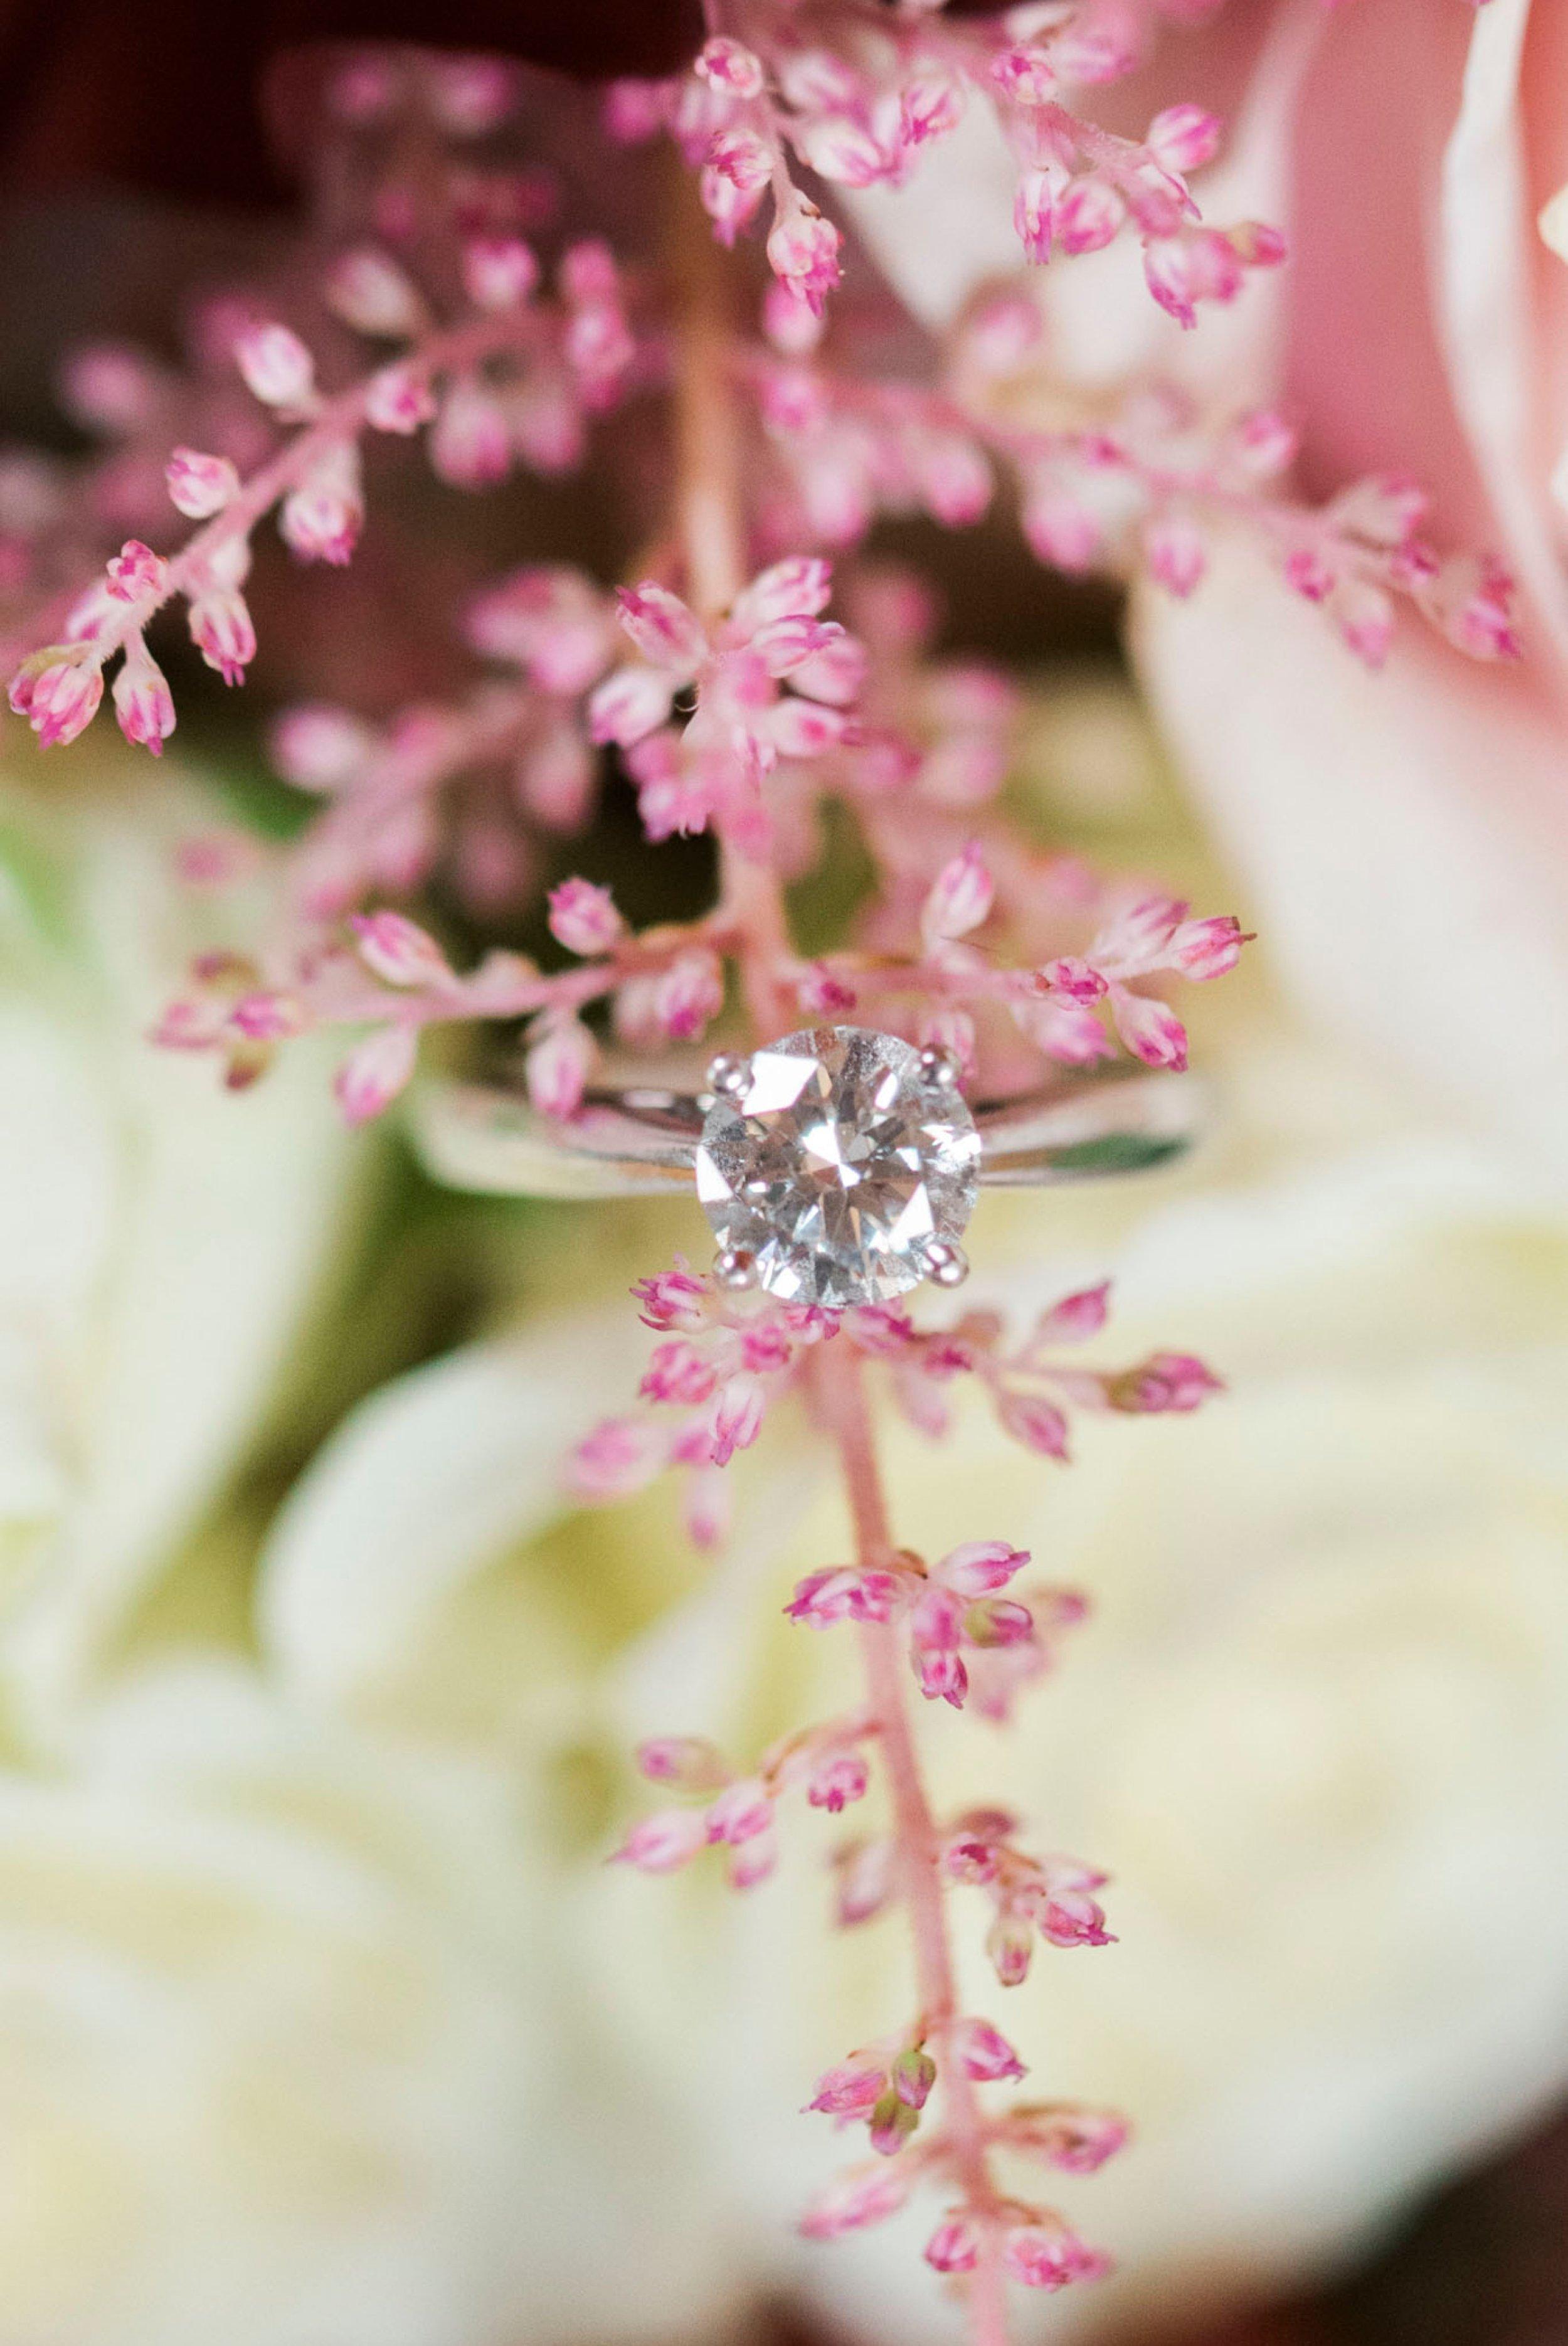 IrvineEstate_LexingtonVA_Wedding_FallWedding_VirginiaWeddingPhotographer 8.jpg